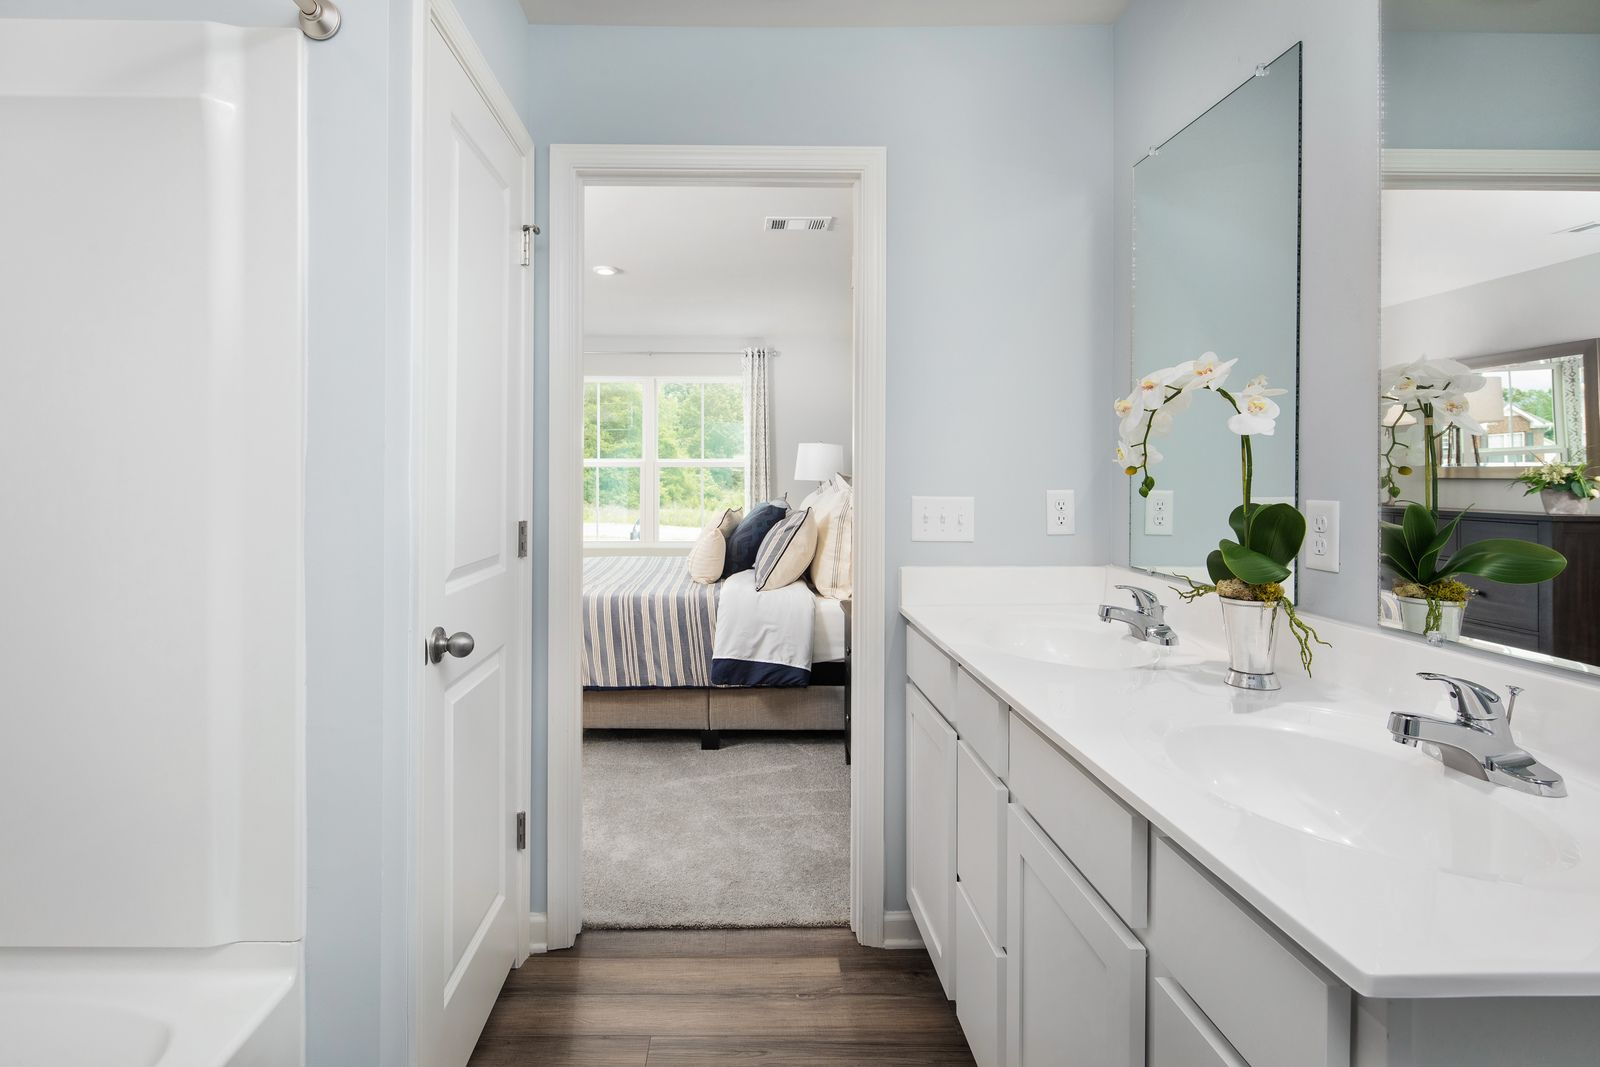 Bathroom featured in the Poplar By Ryan Homes in Nashville, TN